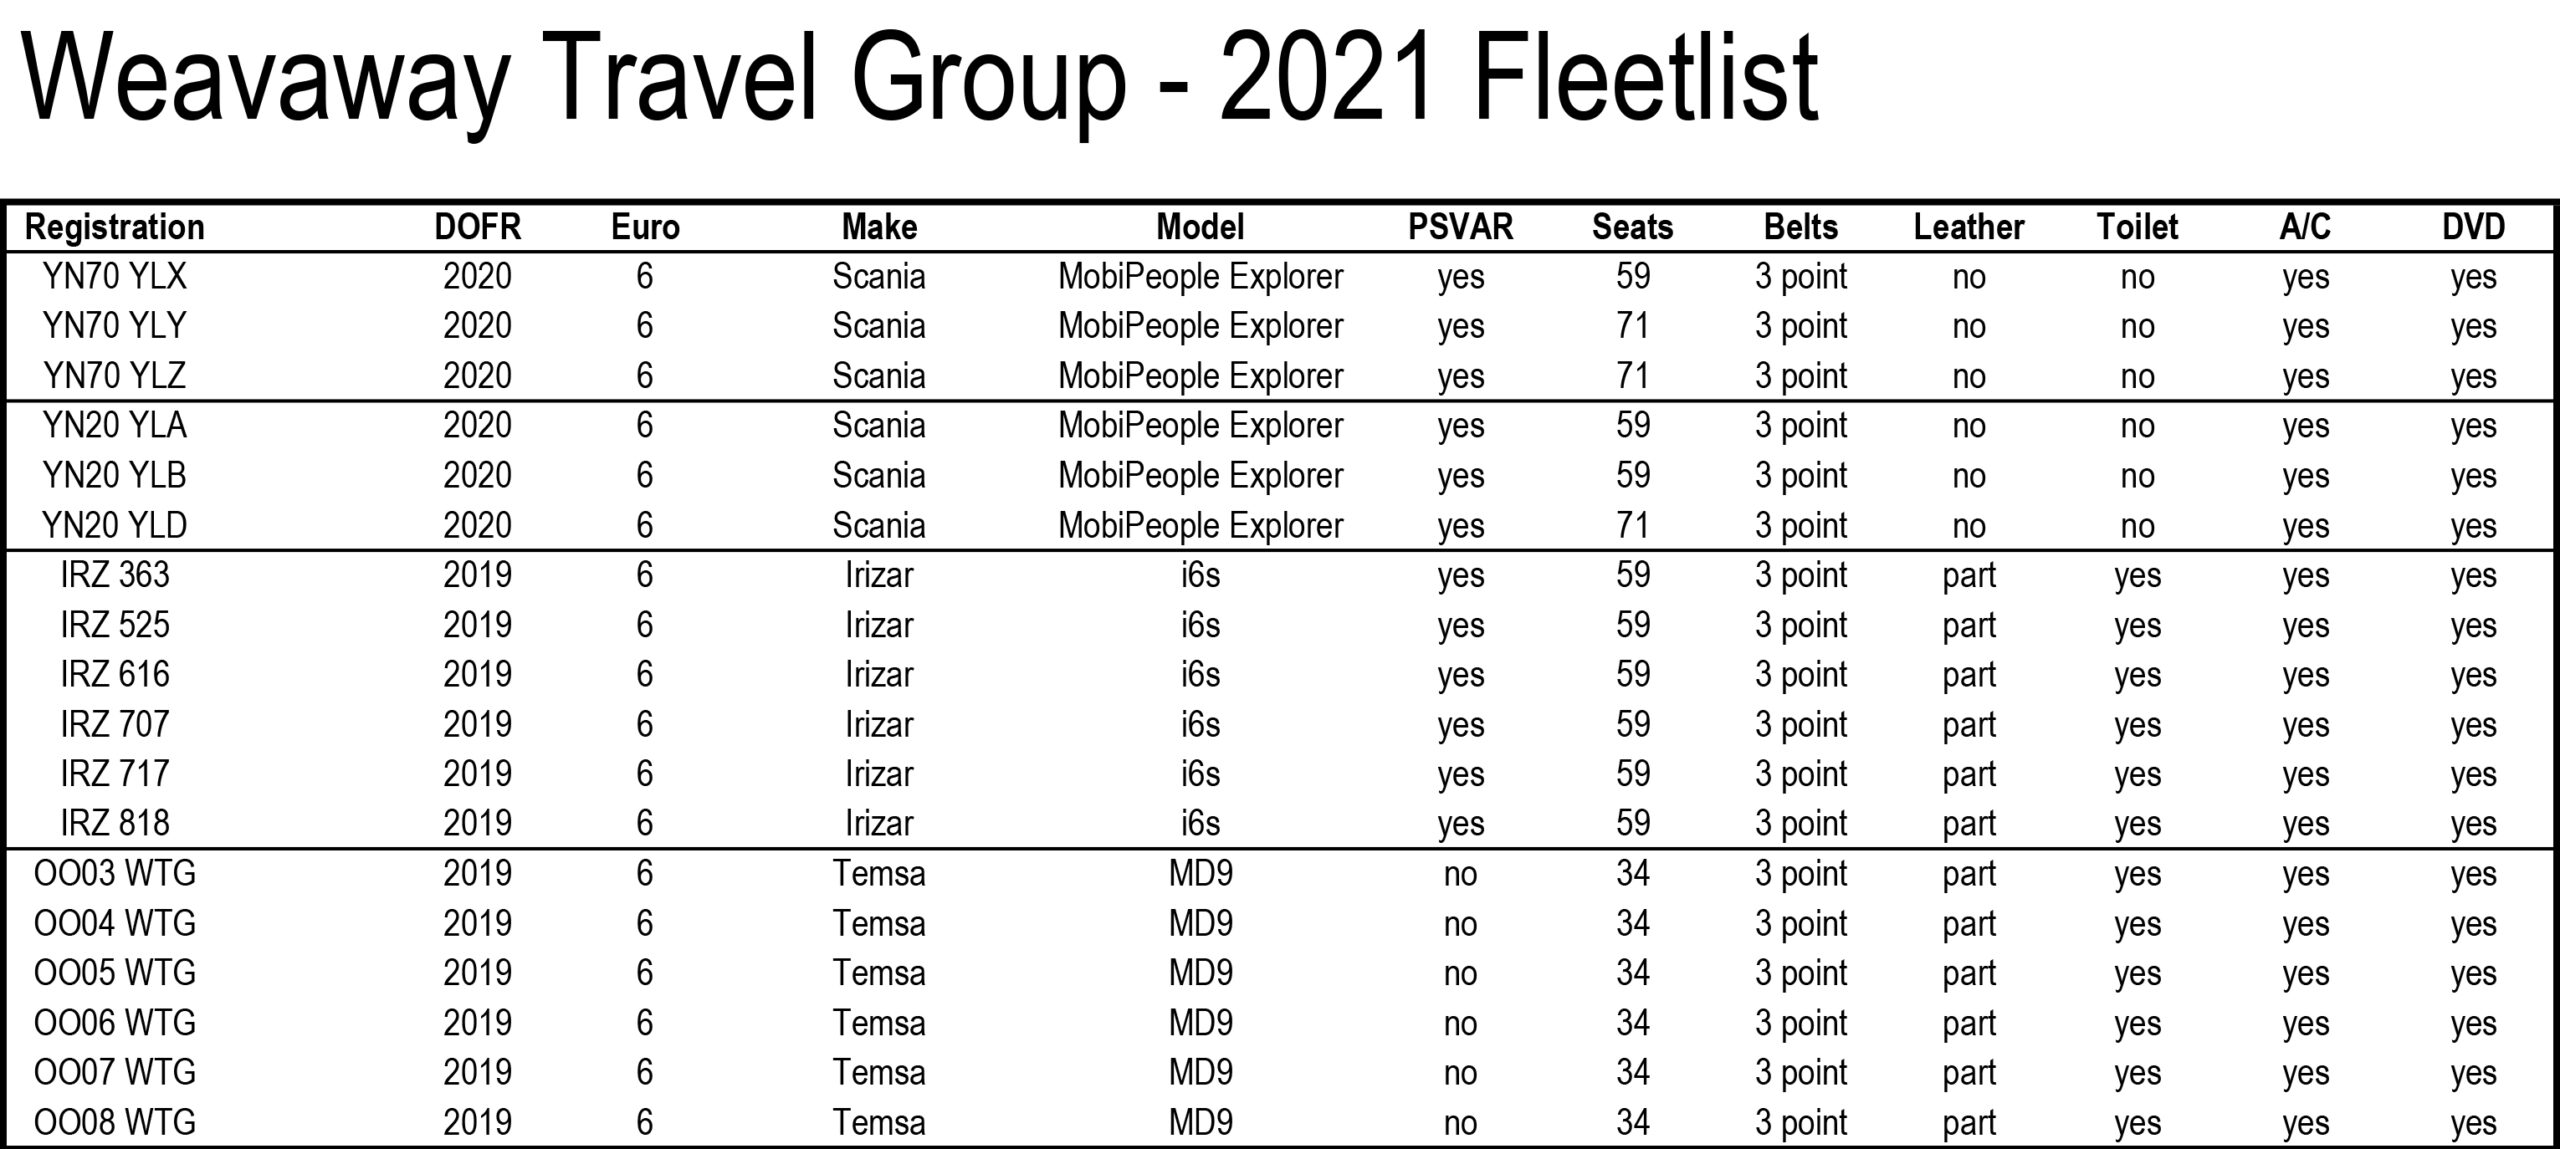 Fleetlist